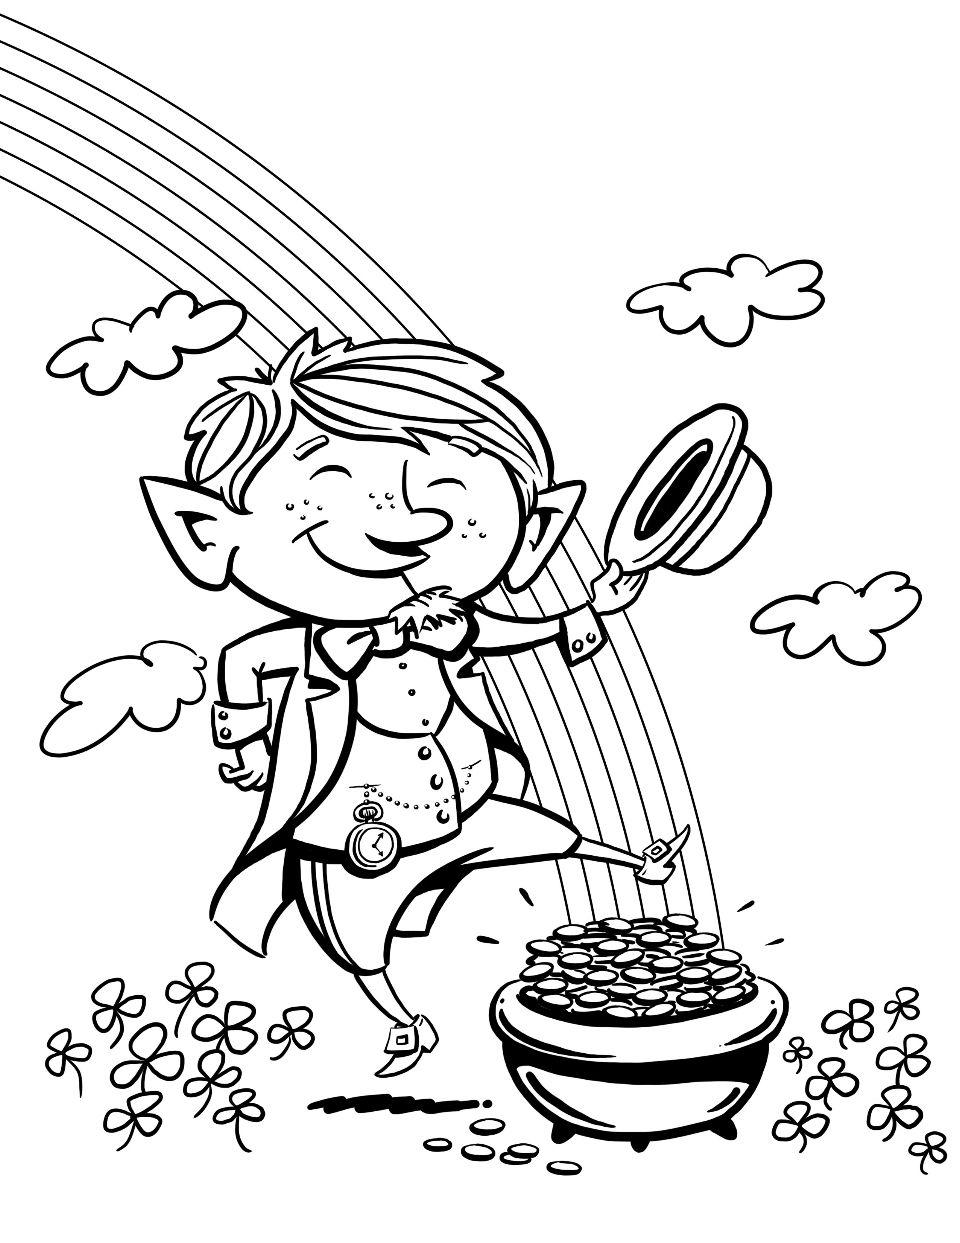 Leprechaun Coloring Pages Best Coloring Pages For Kids Coloring Pages For Kids Leprechaun Coloring Pages [ 1243 x 960 Pixel ]